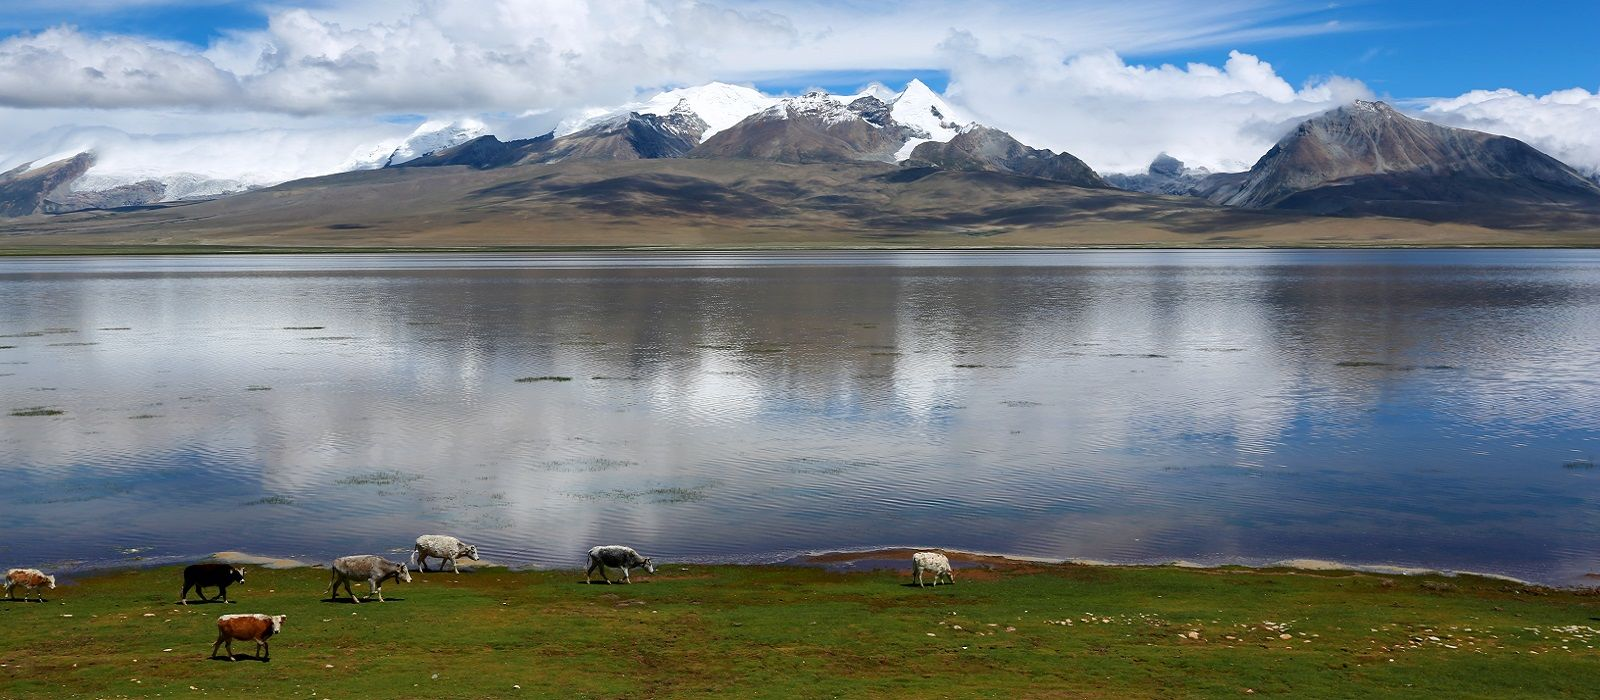 Destination Gyantse Tibet